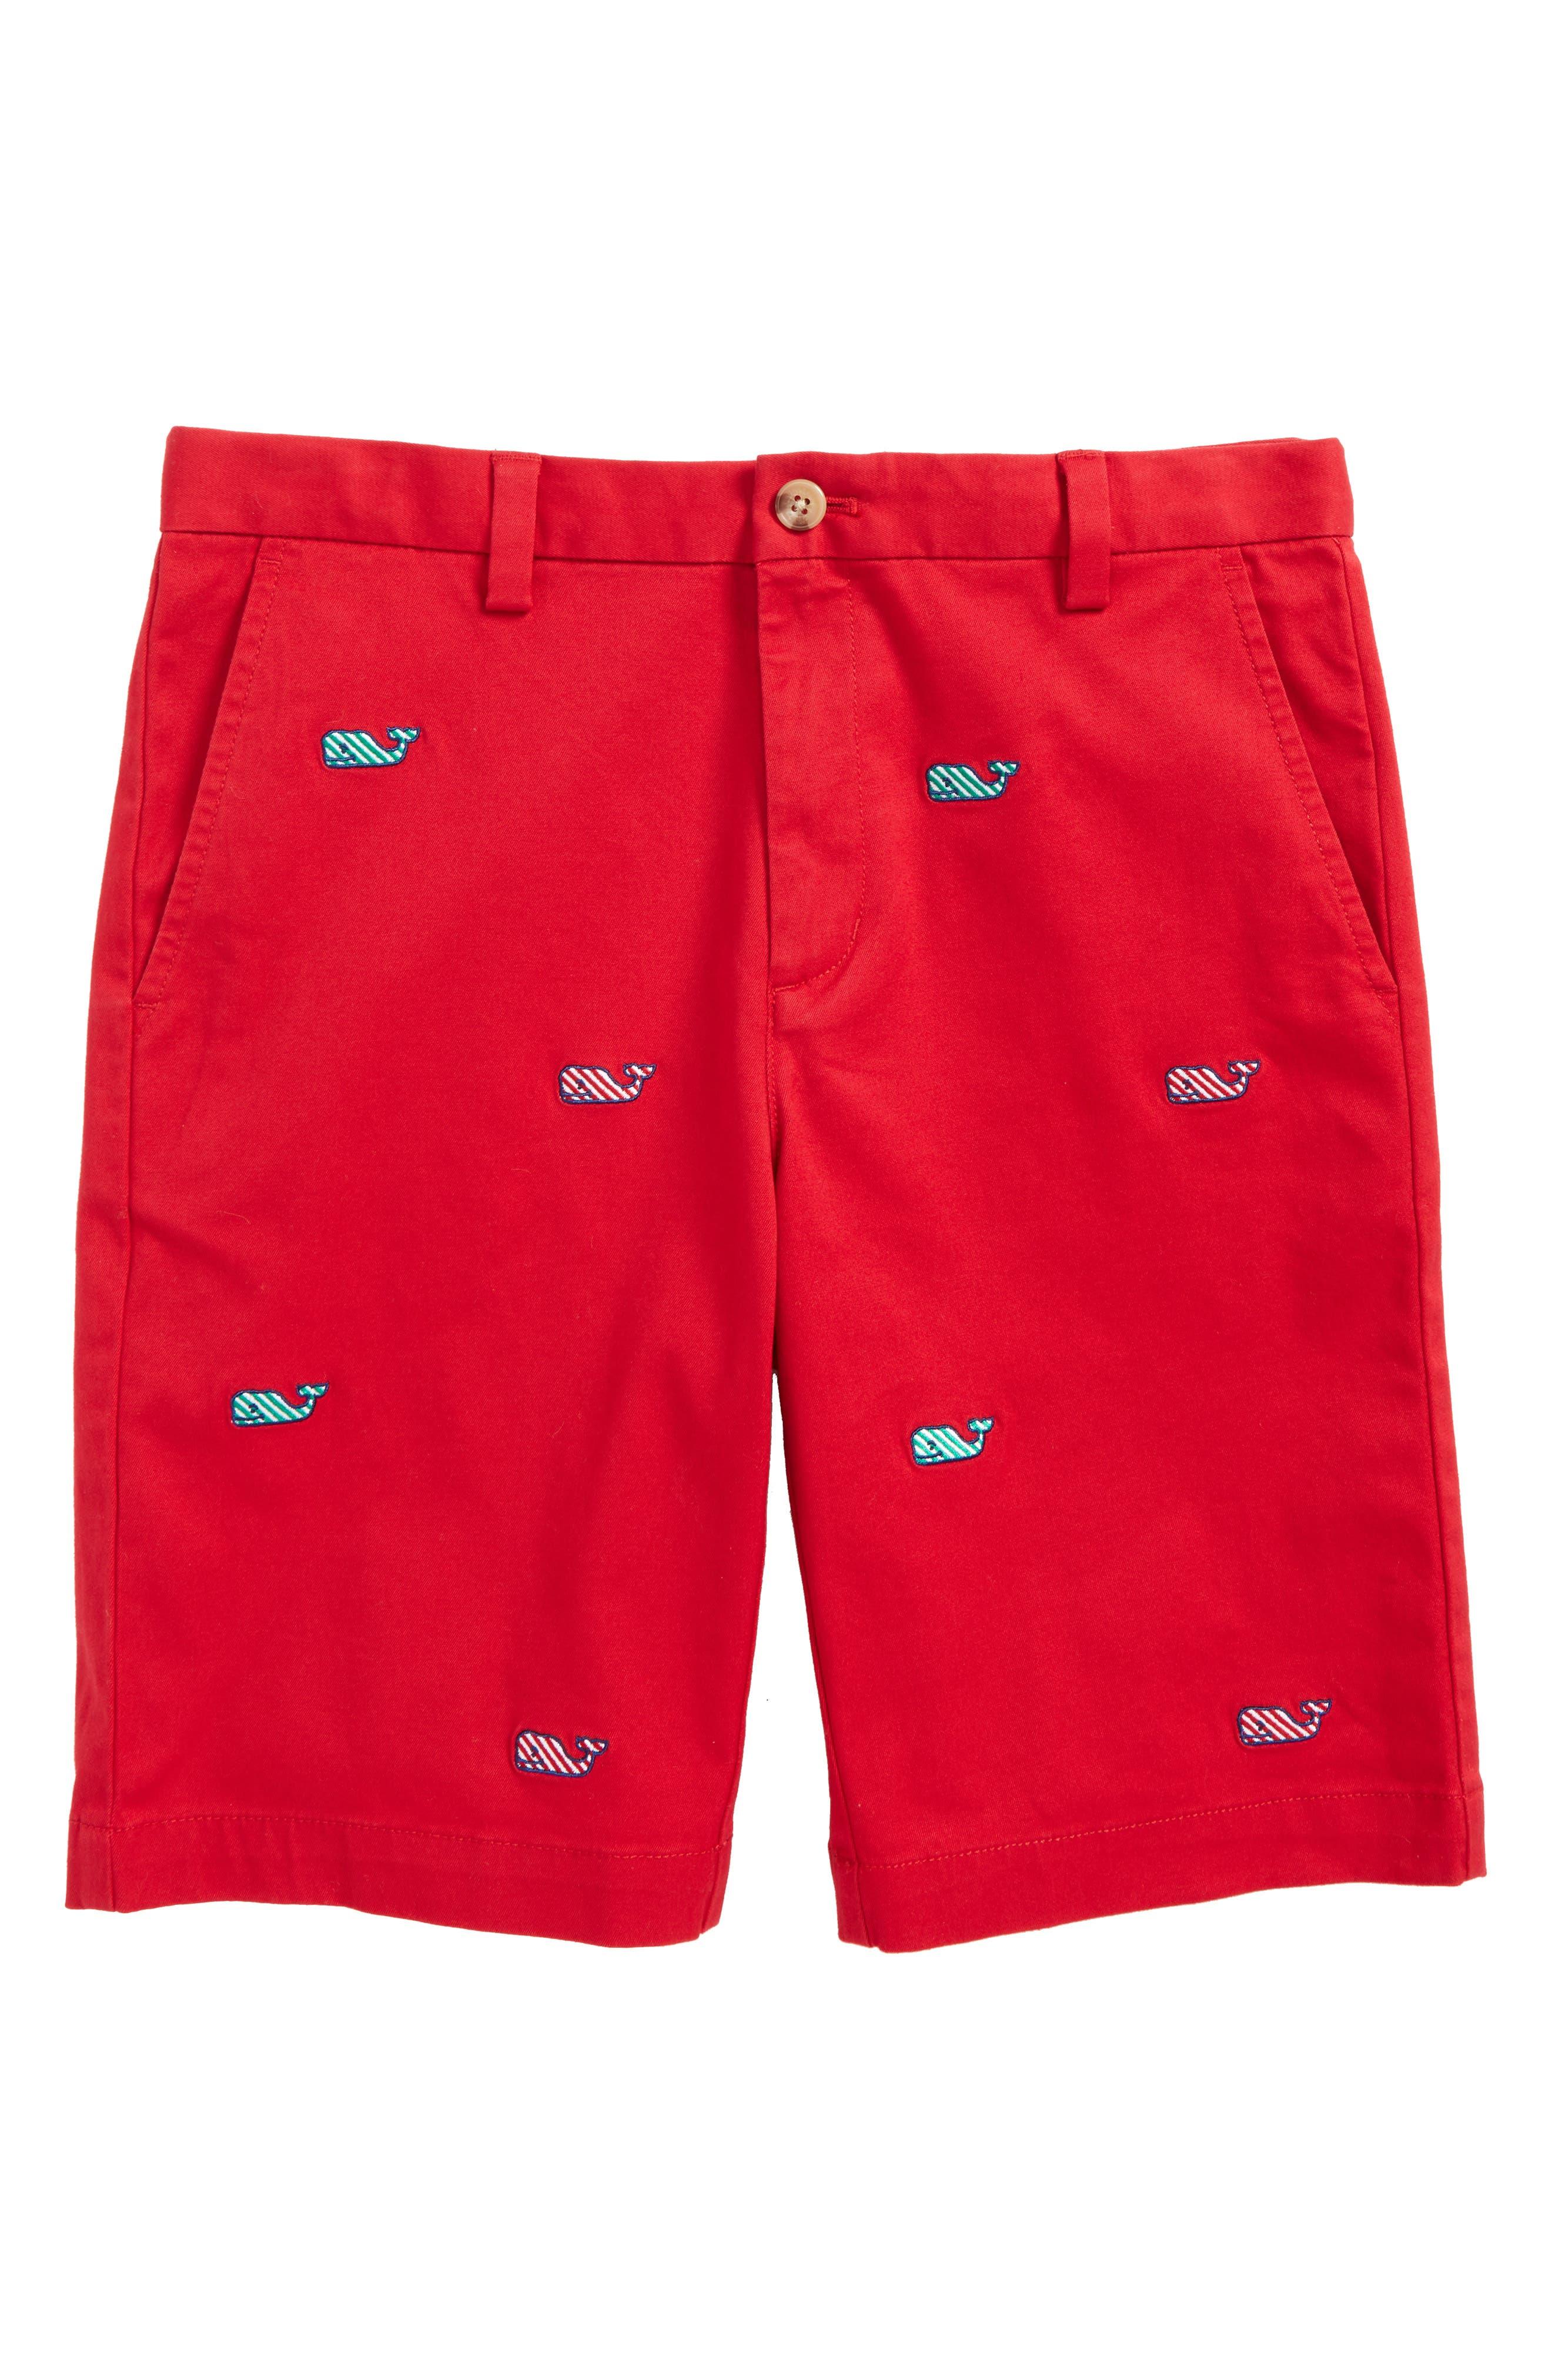 Main Image - vineyard vines Candy Cane Whale Breaker Shorts (Big Boys)